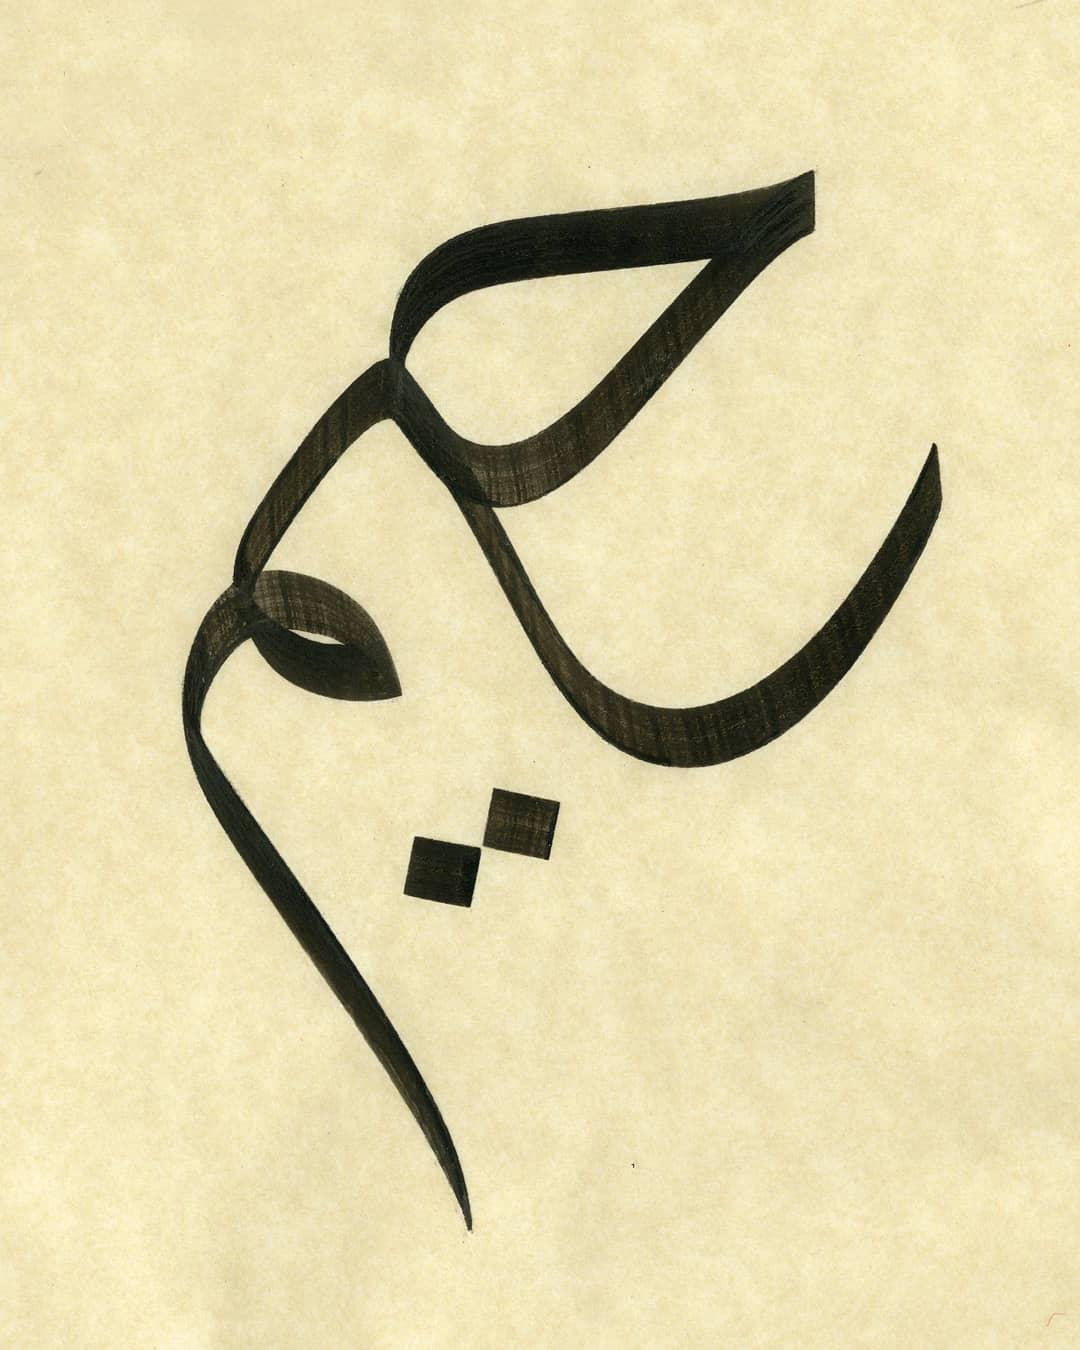 Hattat Kasım Kara قاسم قاره  Talim...Terbiye... #islamicart #hatsanatı #hattat #kasımkara #tezhip #artwork... 321 1